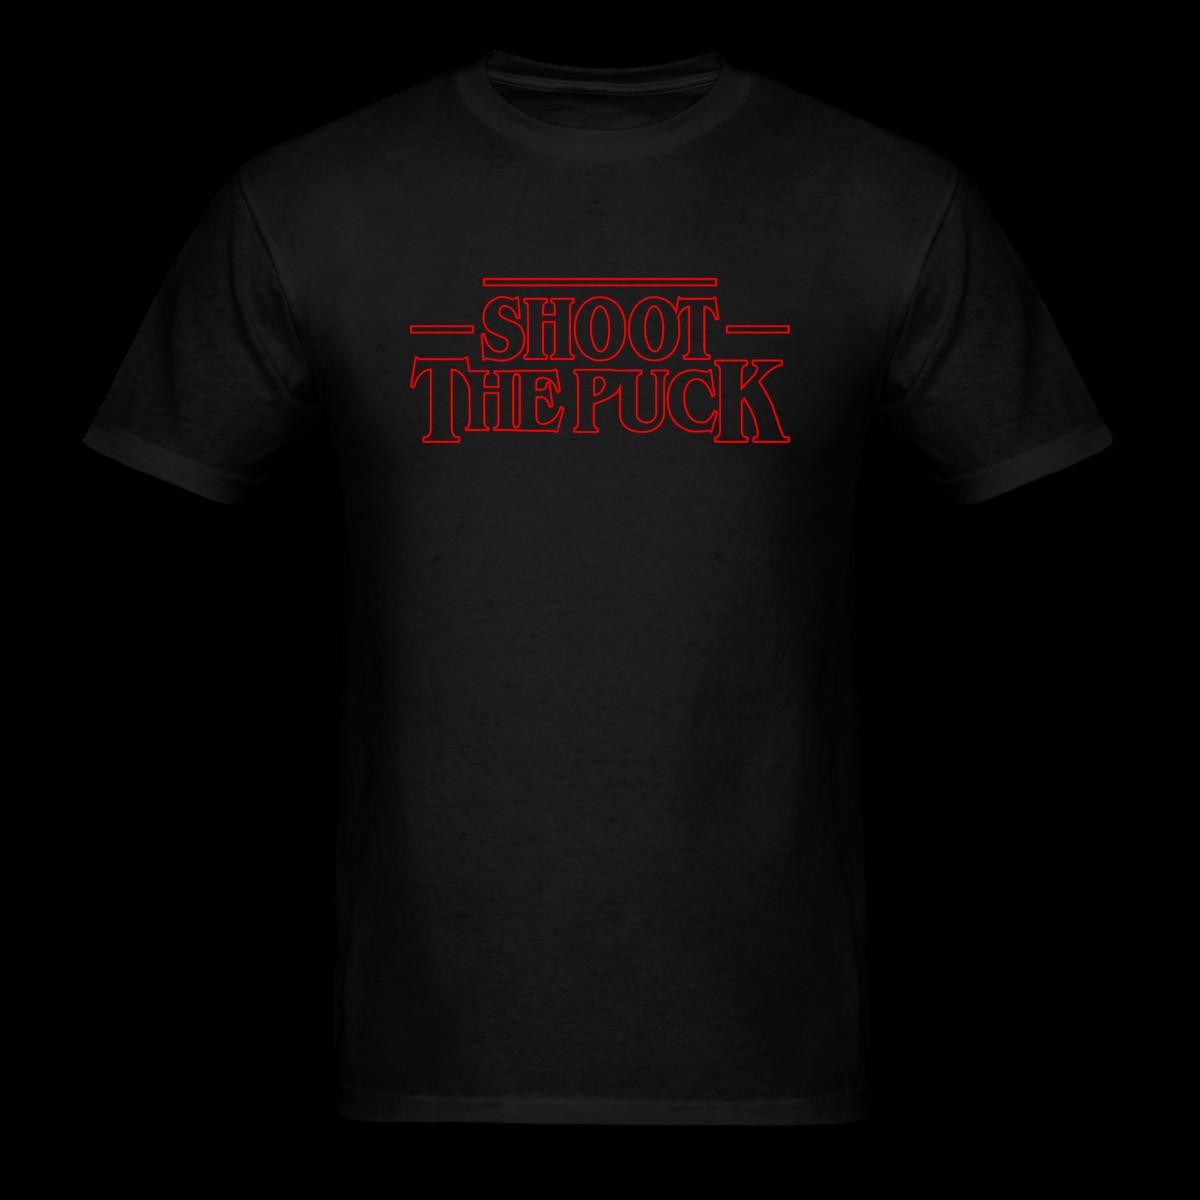 shoot-the-puck-men-s-t-shirt-men-s-t-shirt.png